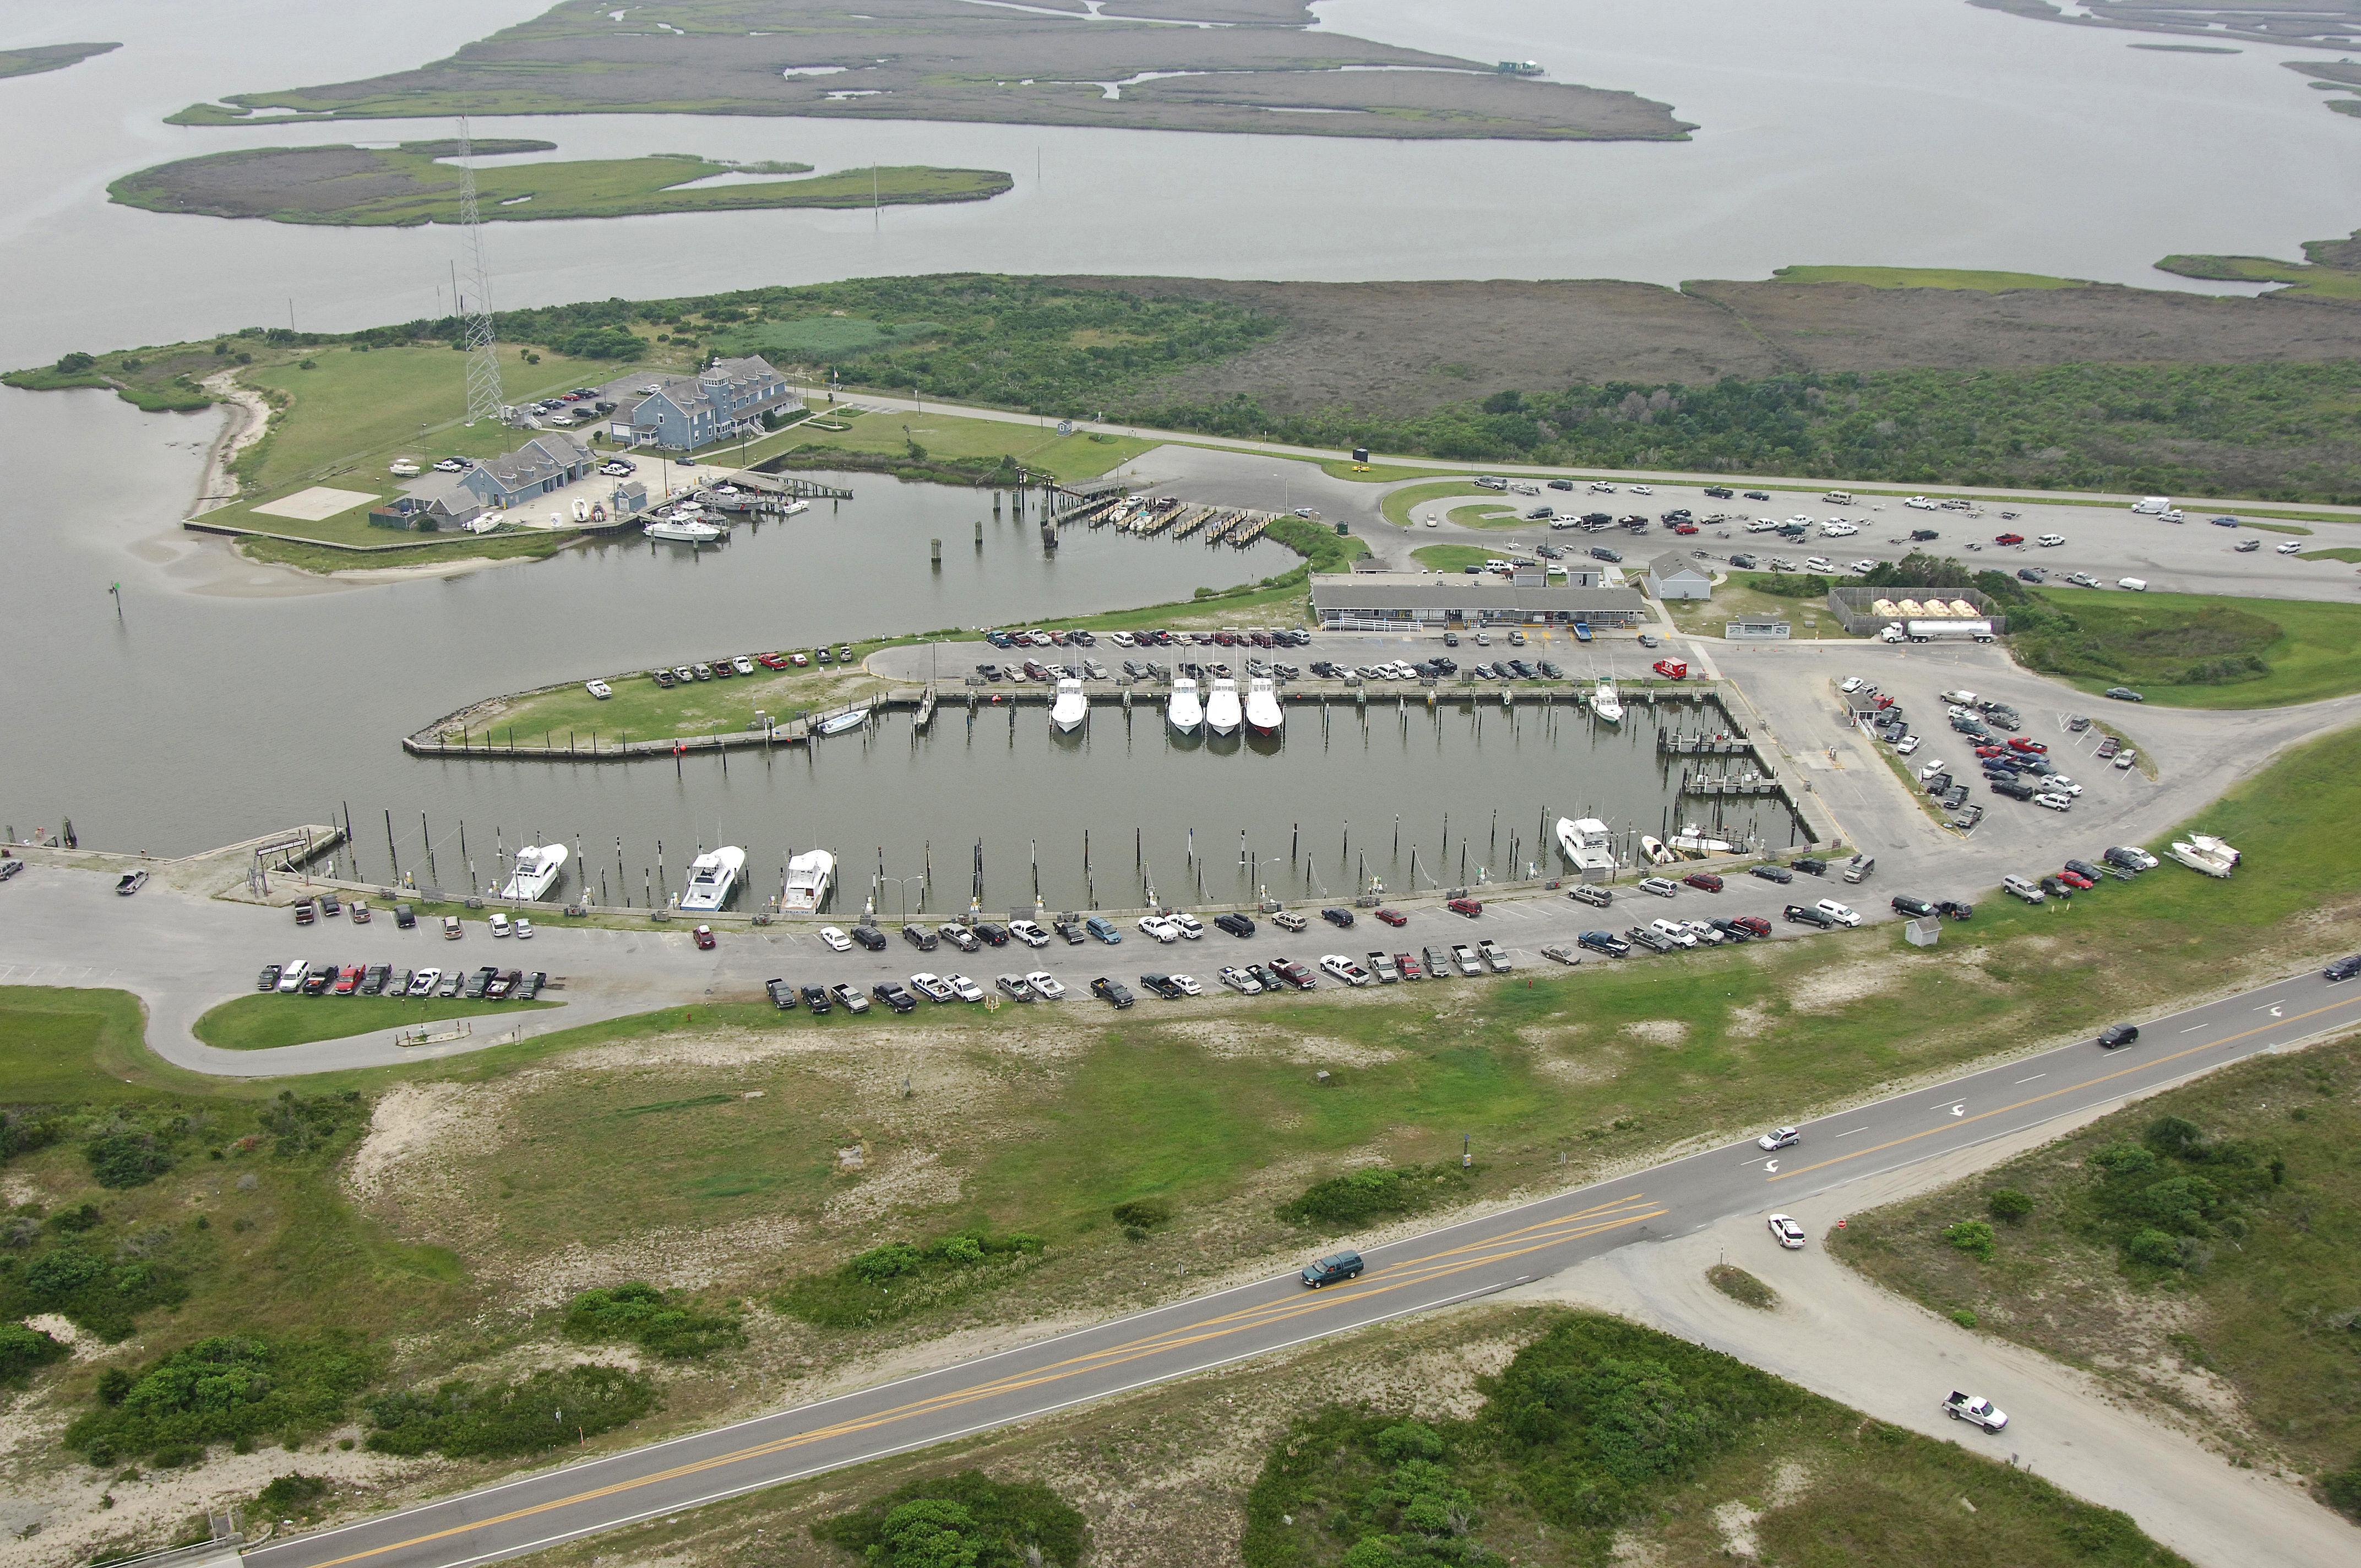 Oregon inlet fishing center in manteo nc united states for Oregon inlet fishing center